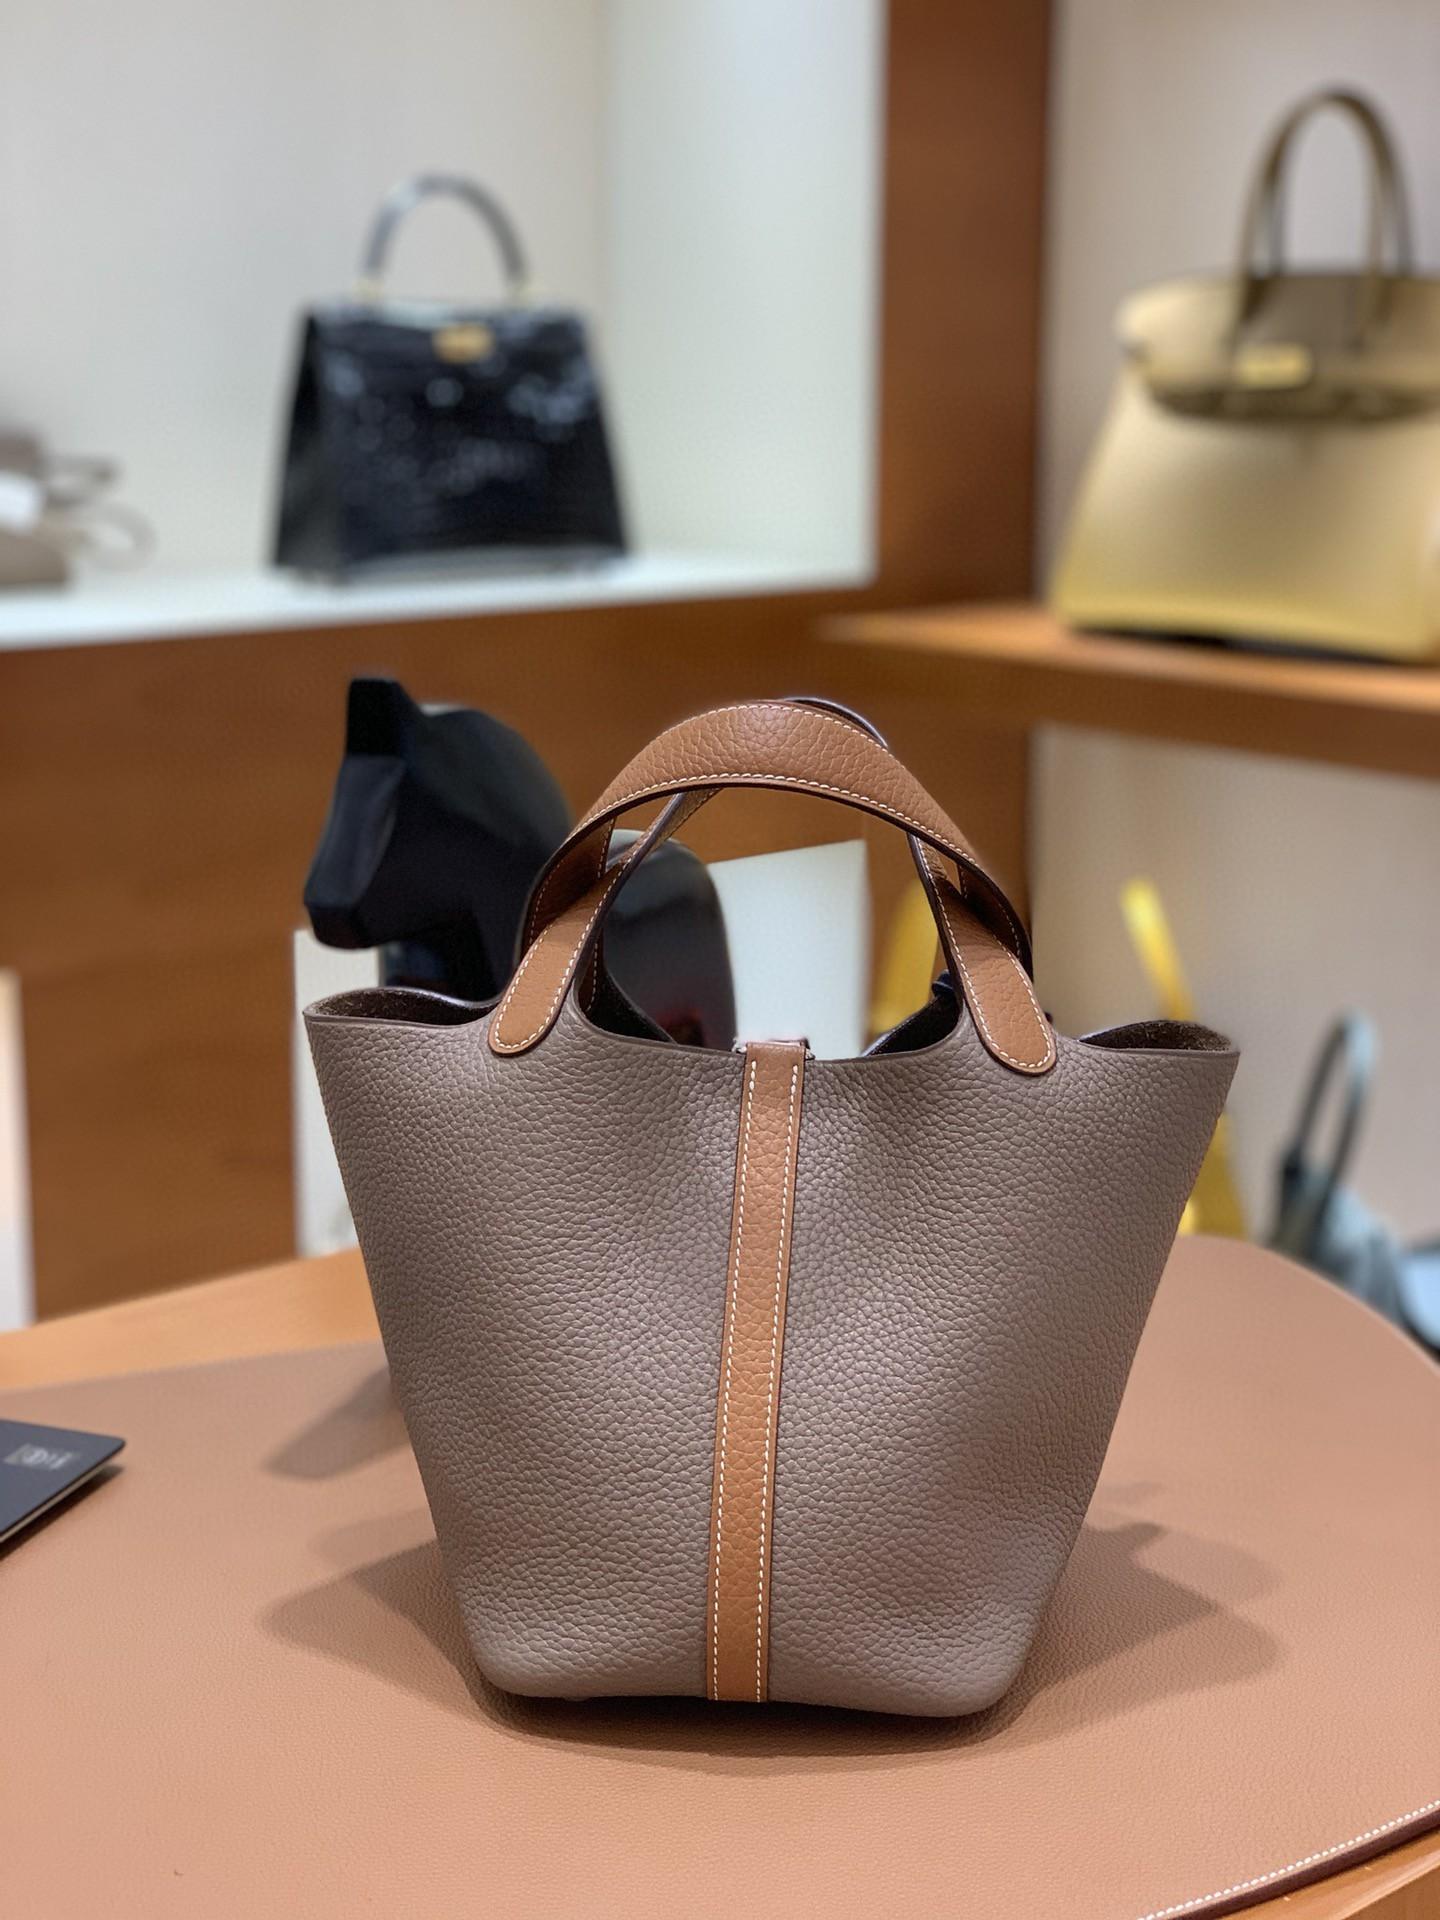 Hermès(爱马仕)Picotin 菜篮子 TC 金棕色拼大象灰 银扣 18cm